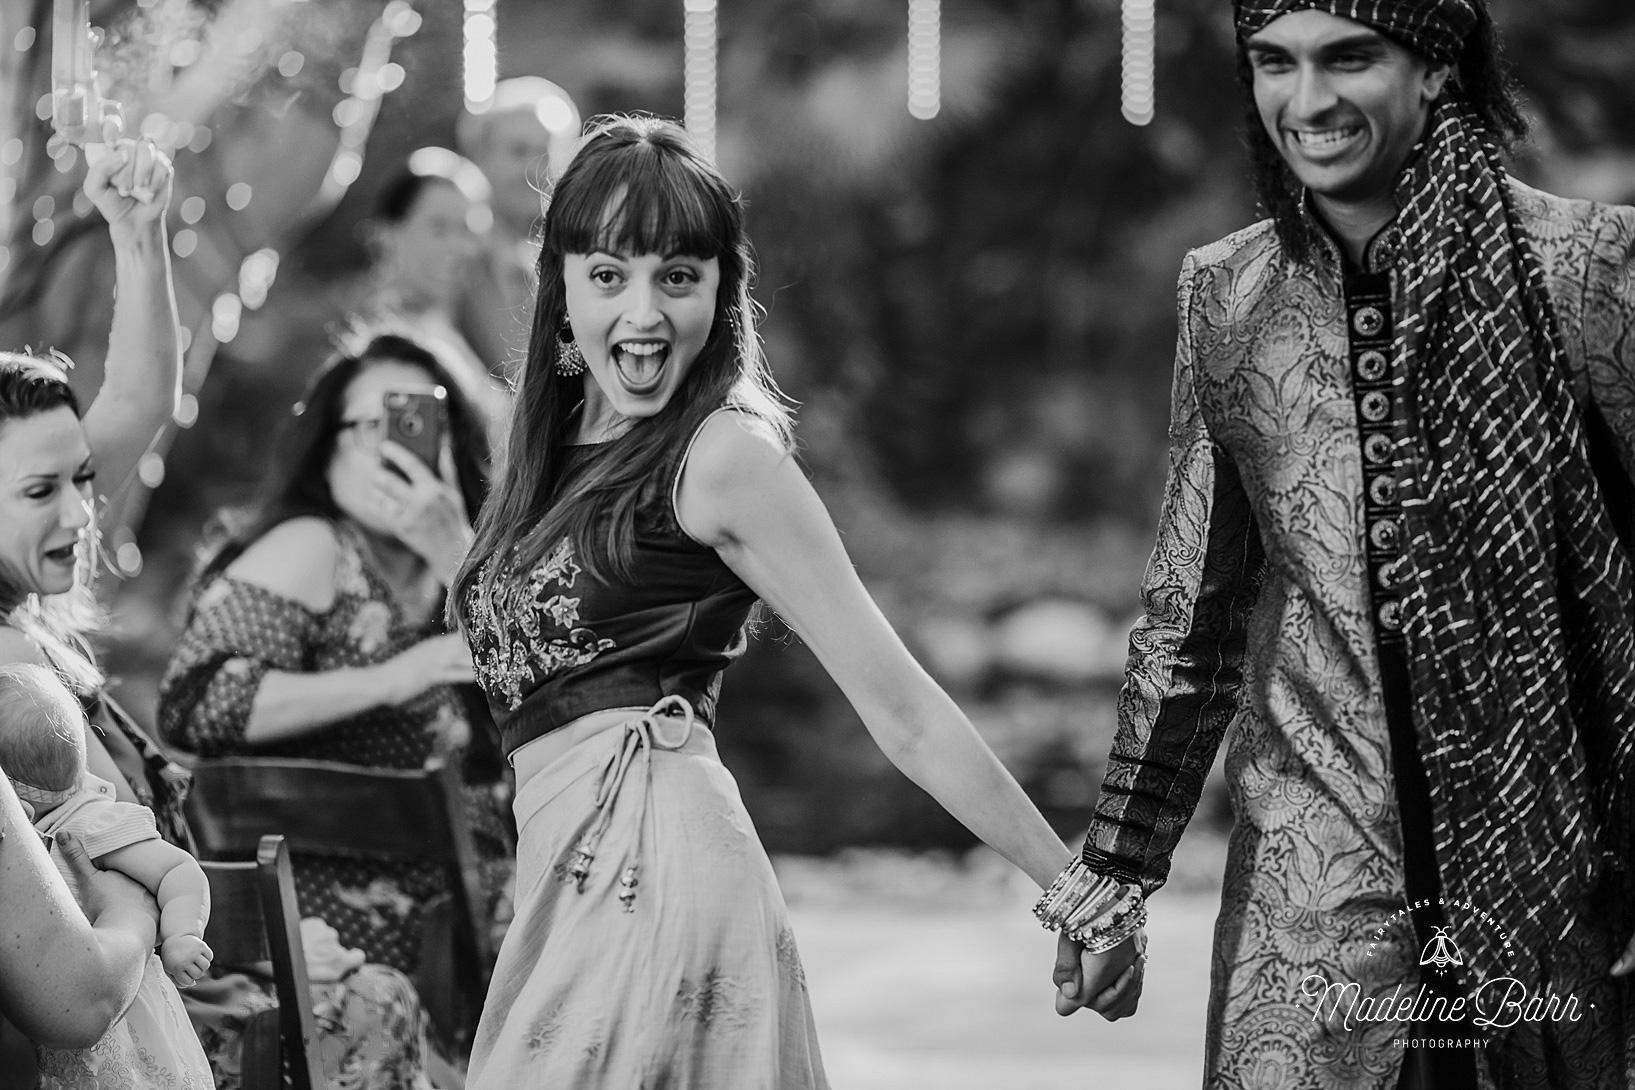 SanDiego_Multicultural_Elopement_Wedding0018s.jpg